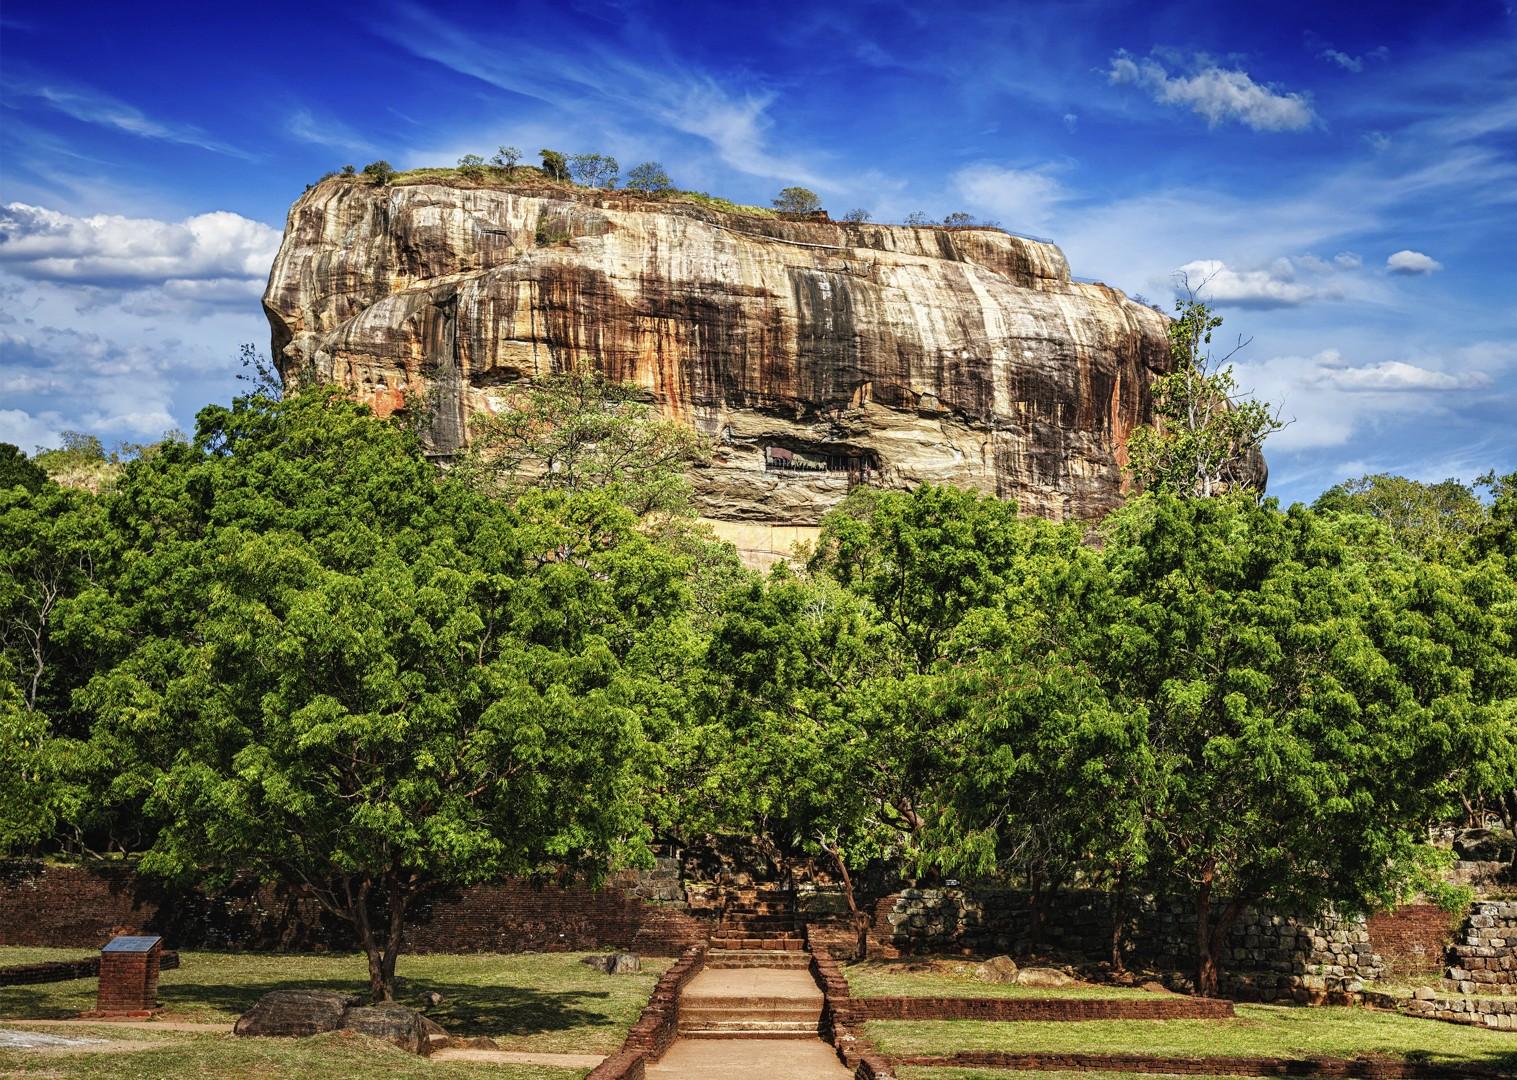 cycling-adventure-in-sri-lanka-sigiriya-lionrock.jpg - Sri Lanka - Backroads and Beaches - Cycling Adventures